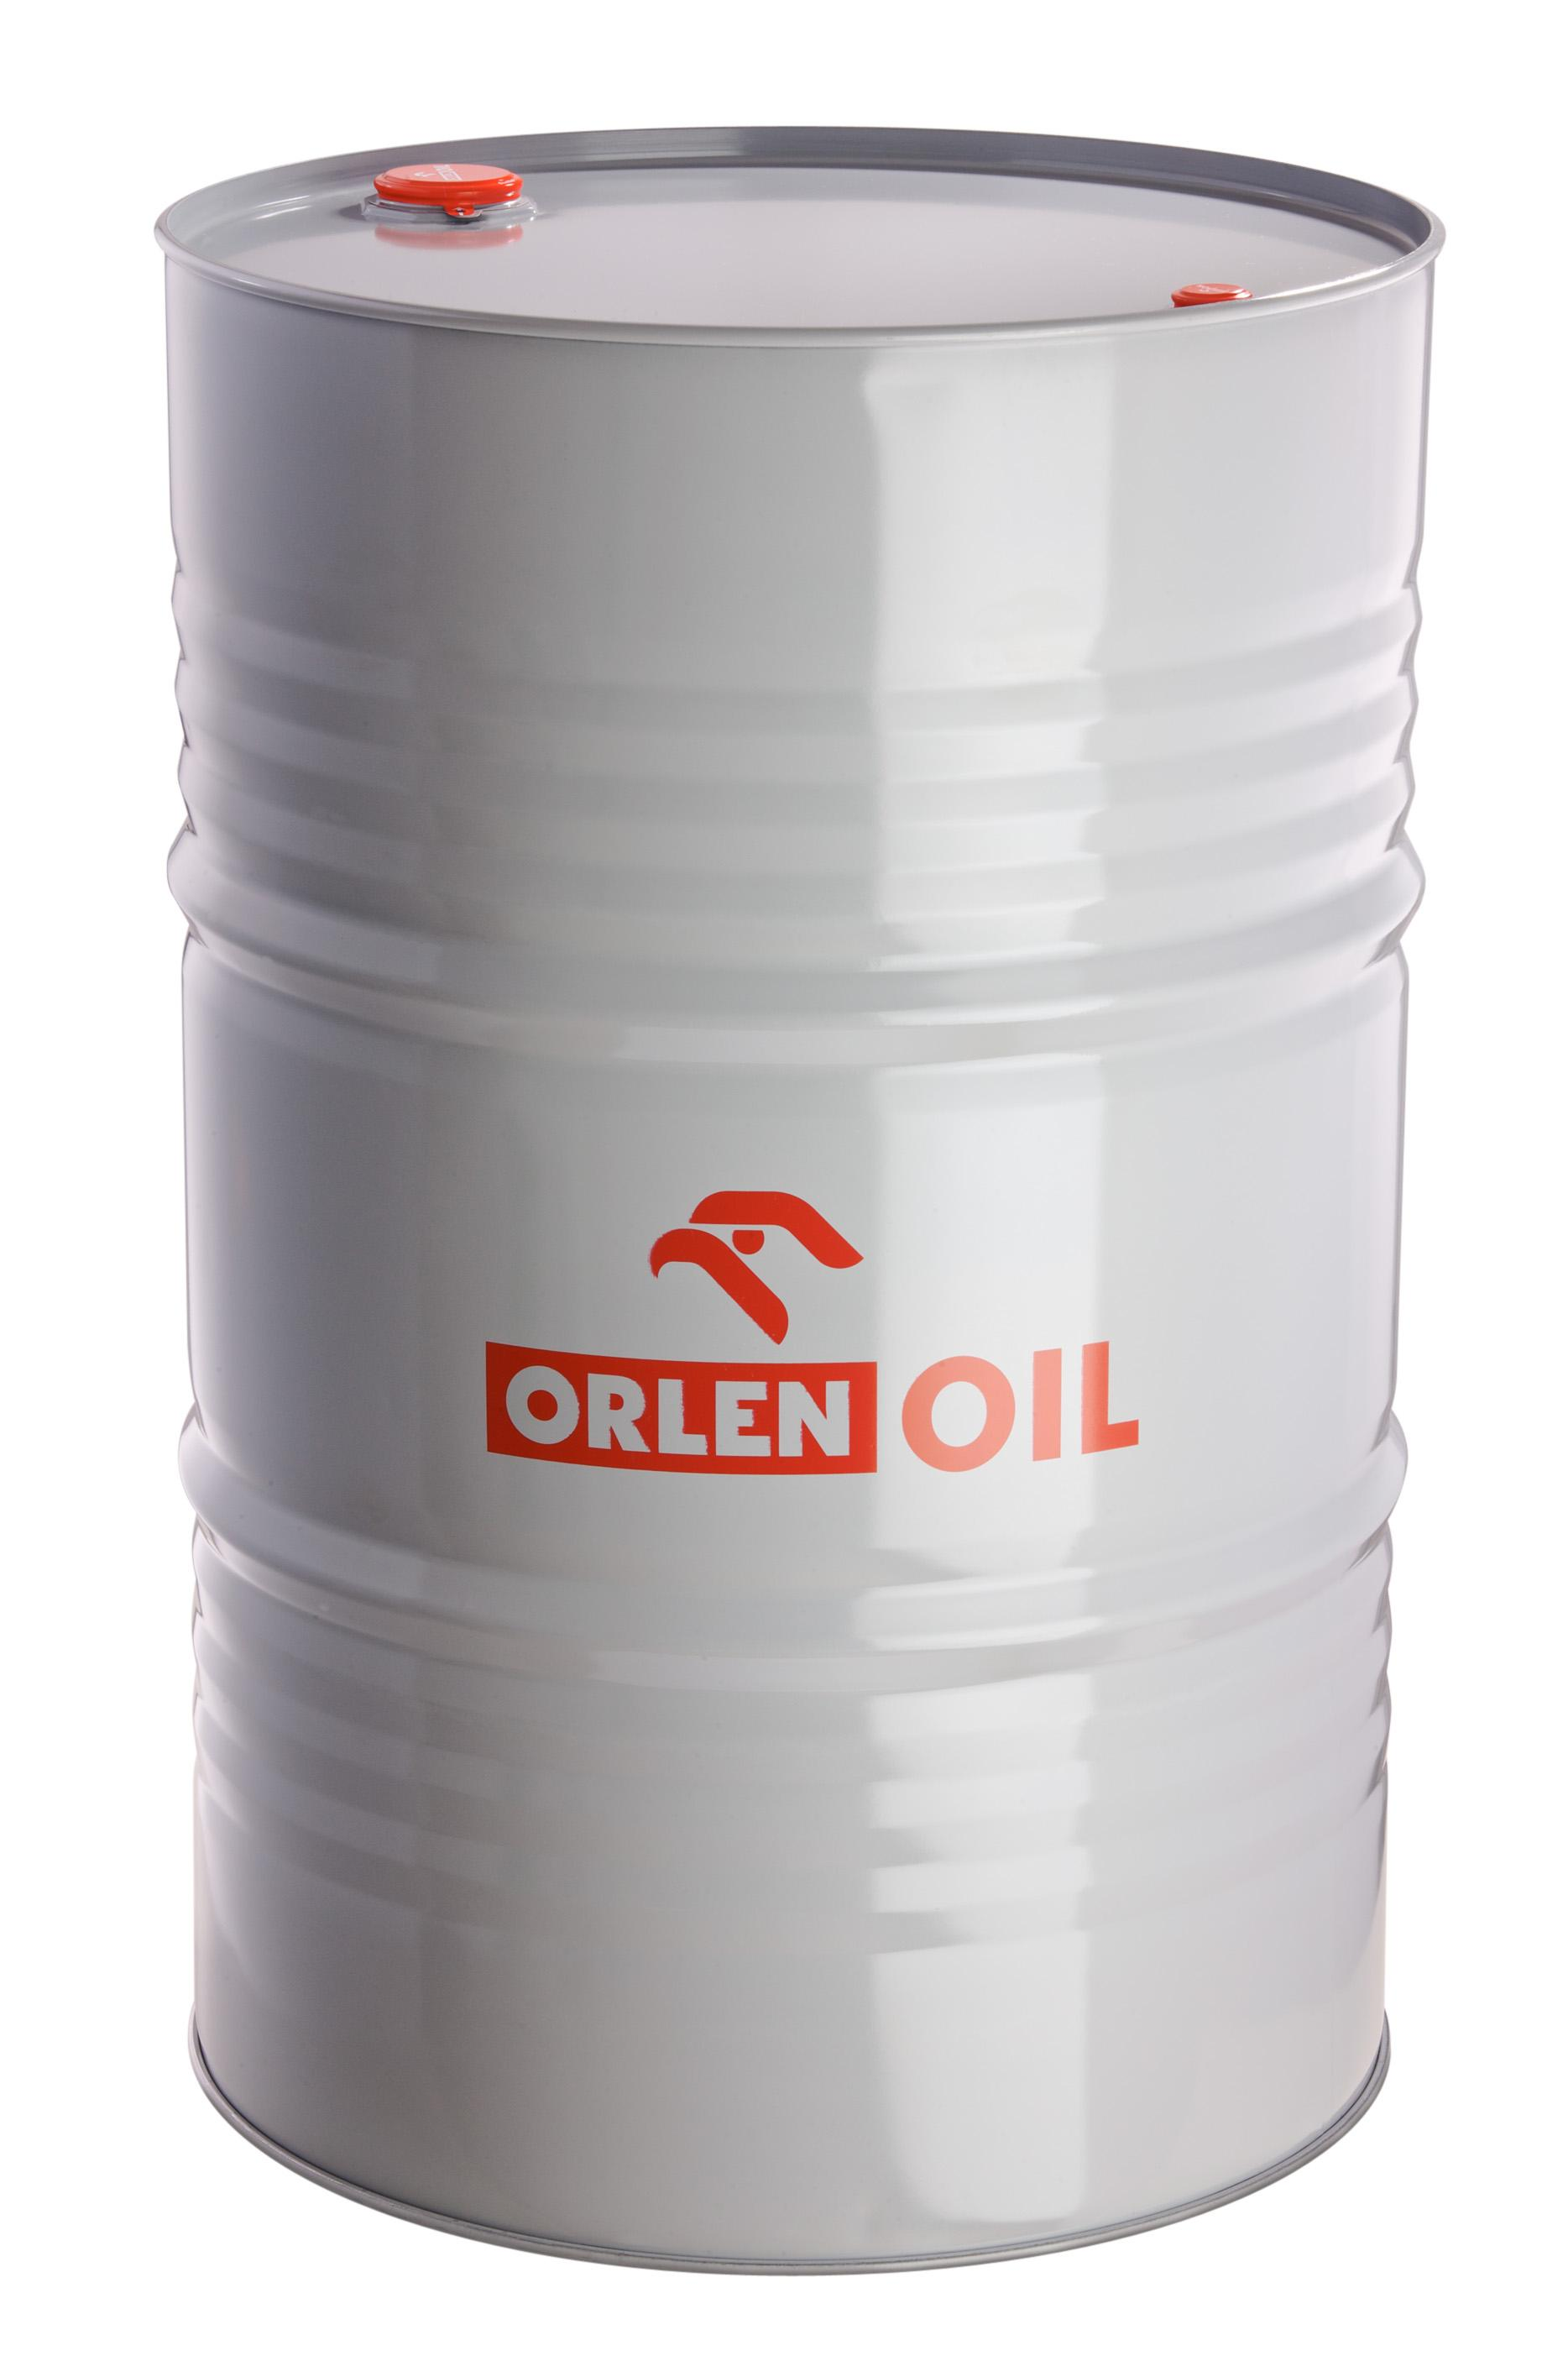 ORLEN OIL HYDROL L-HV 68  PREMIUM  BECZKA 205L **